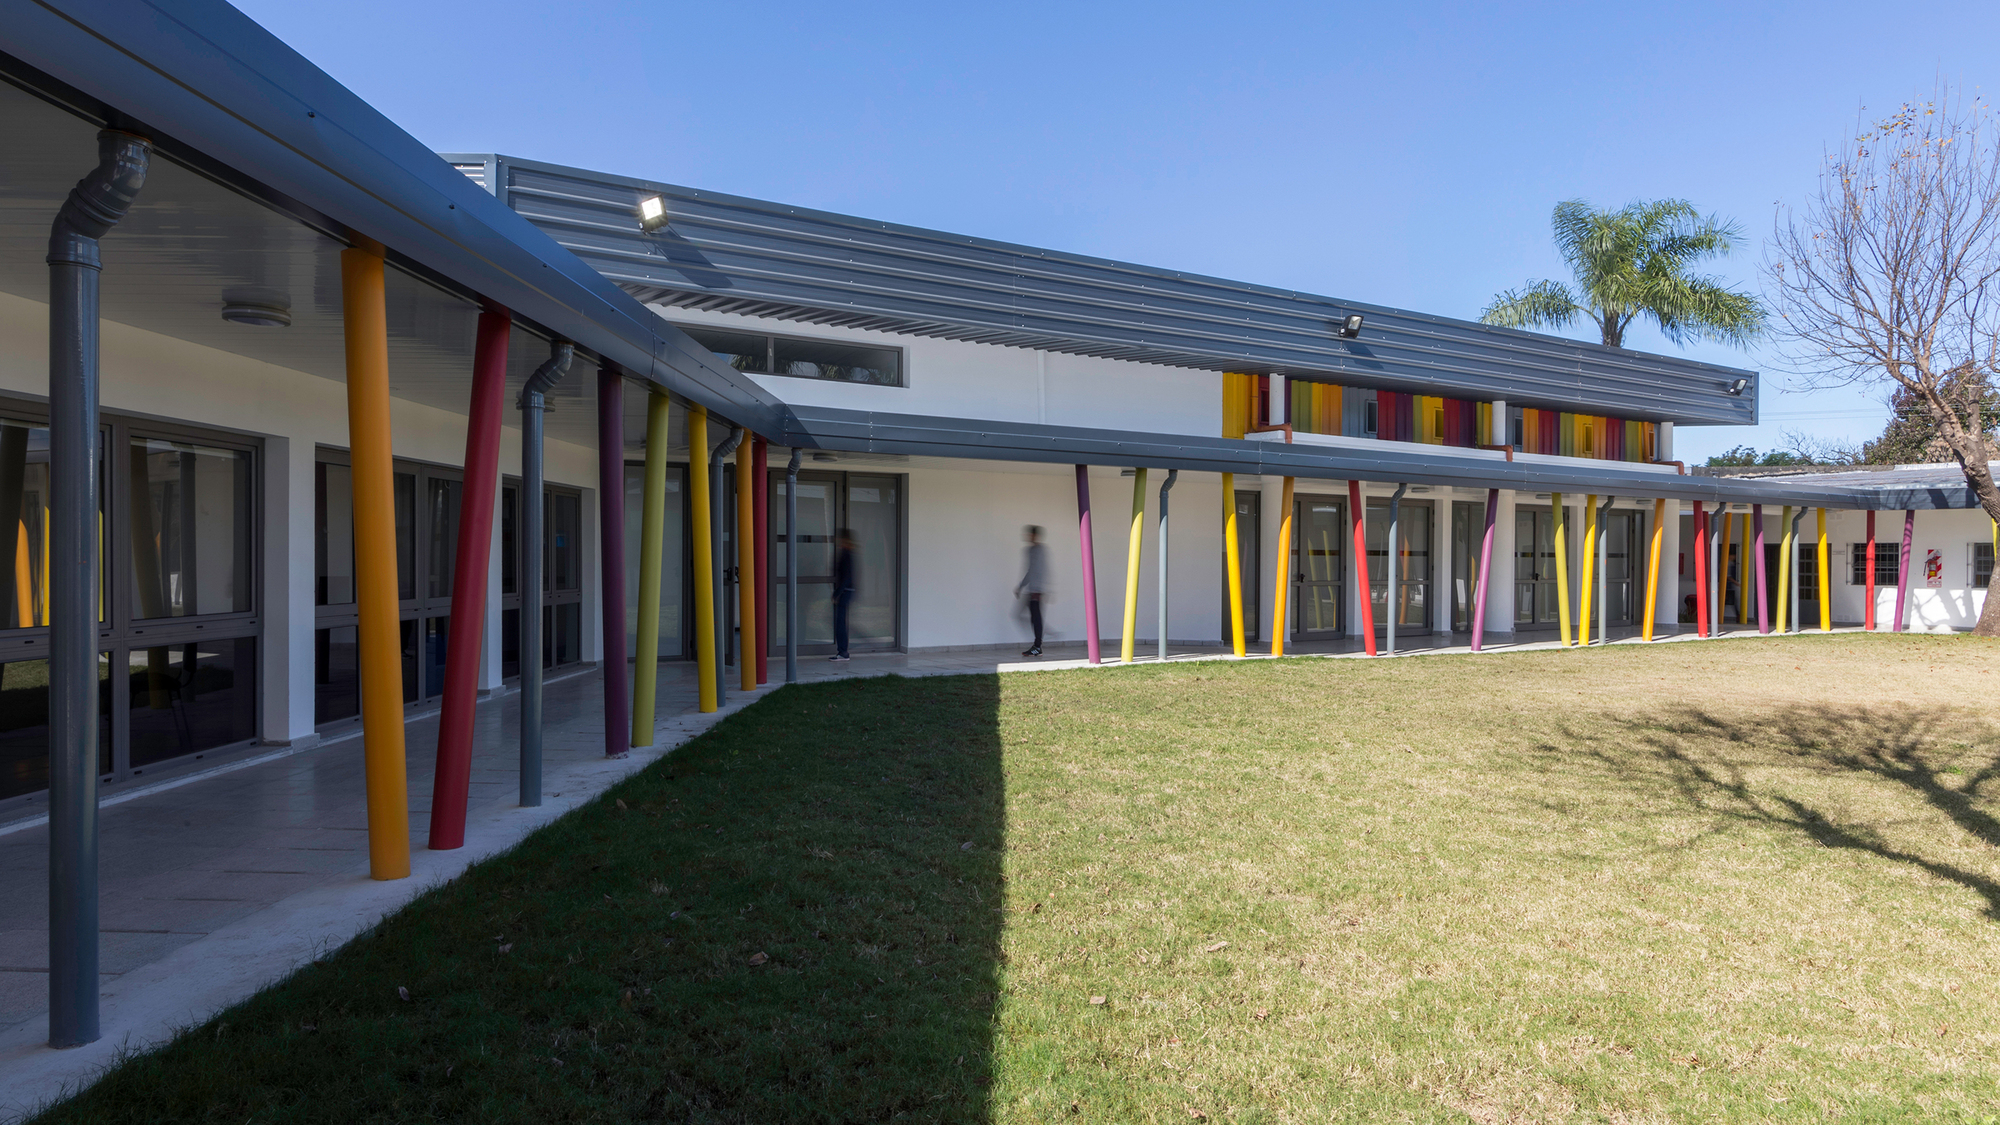 Escuela especial n 149 filli silvestre arquitectas for Universidades para arquitectura